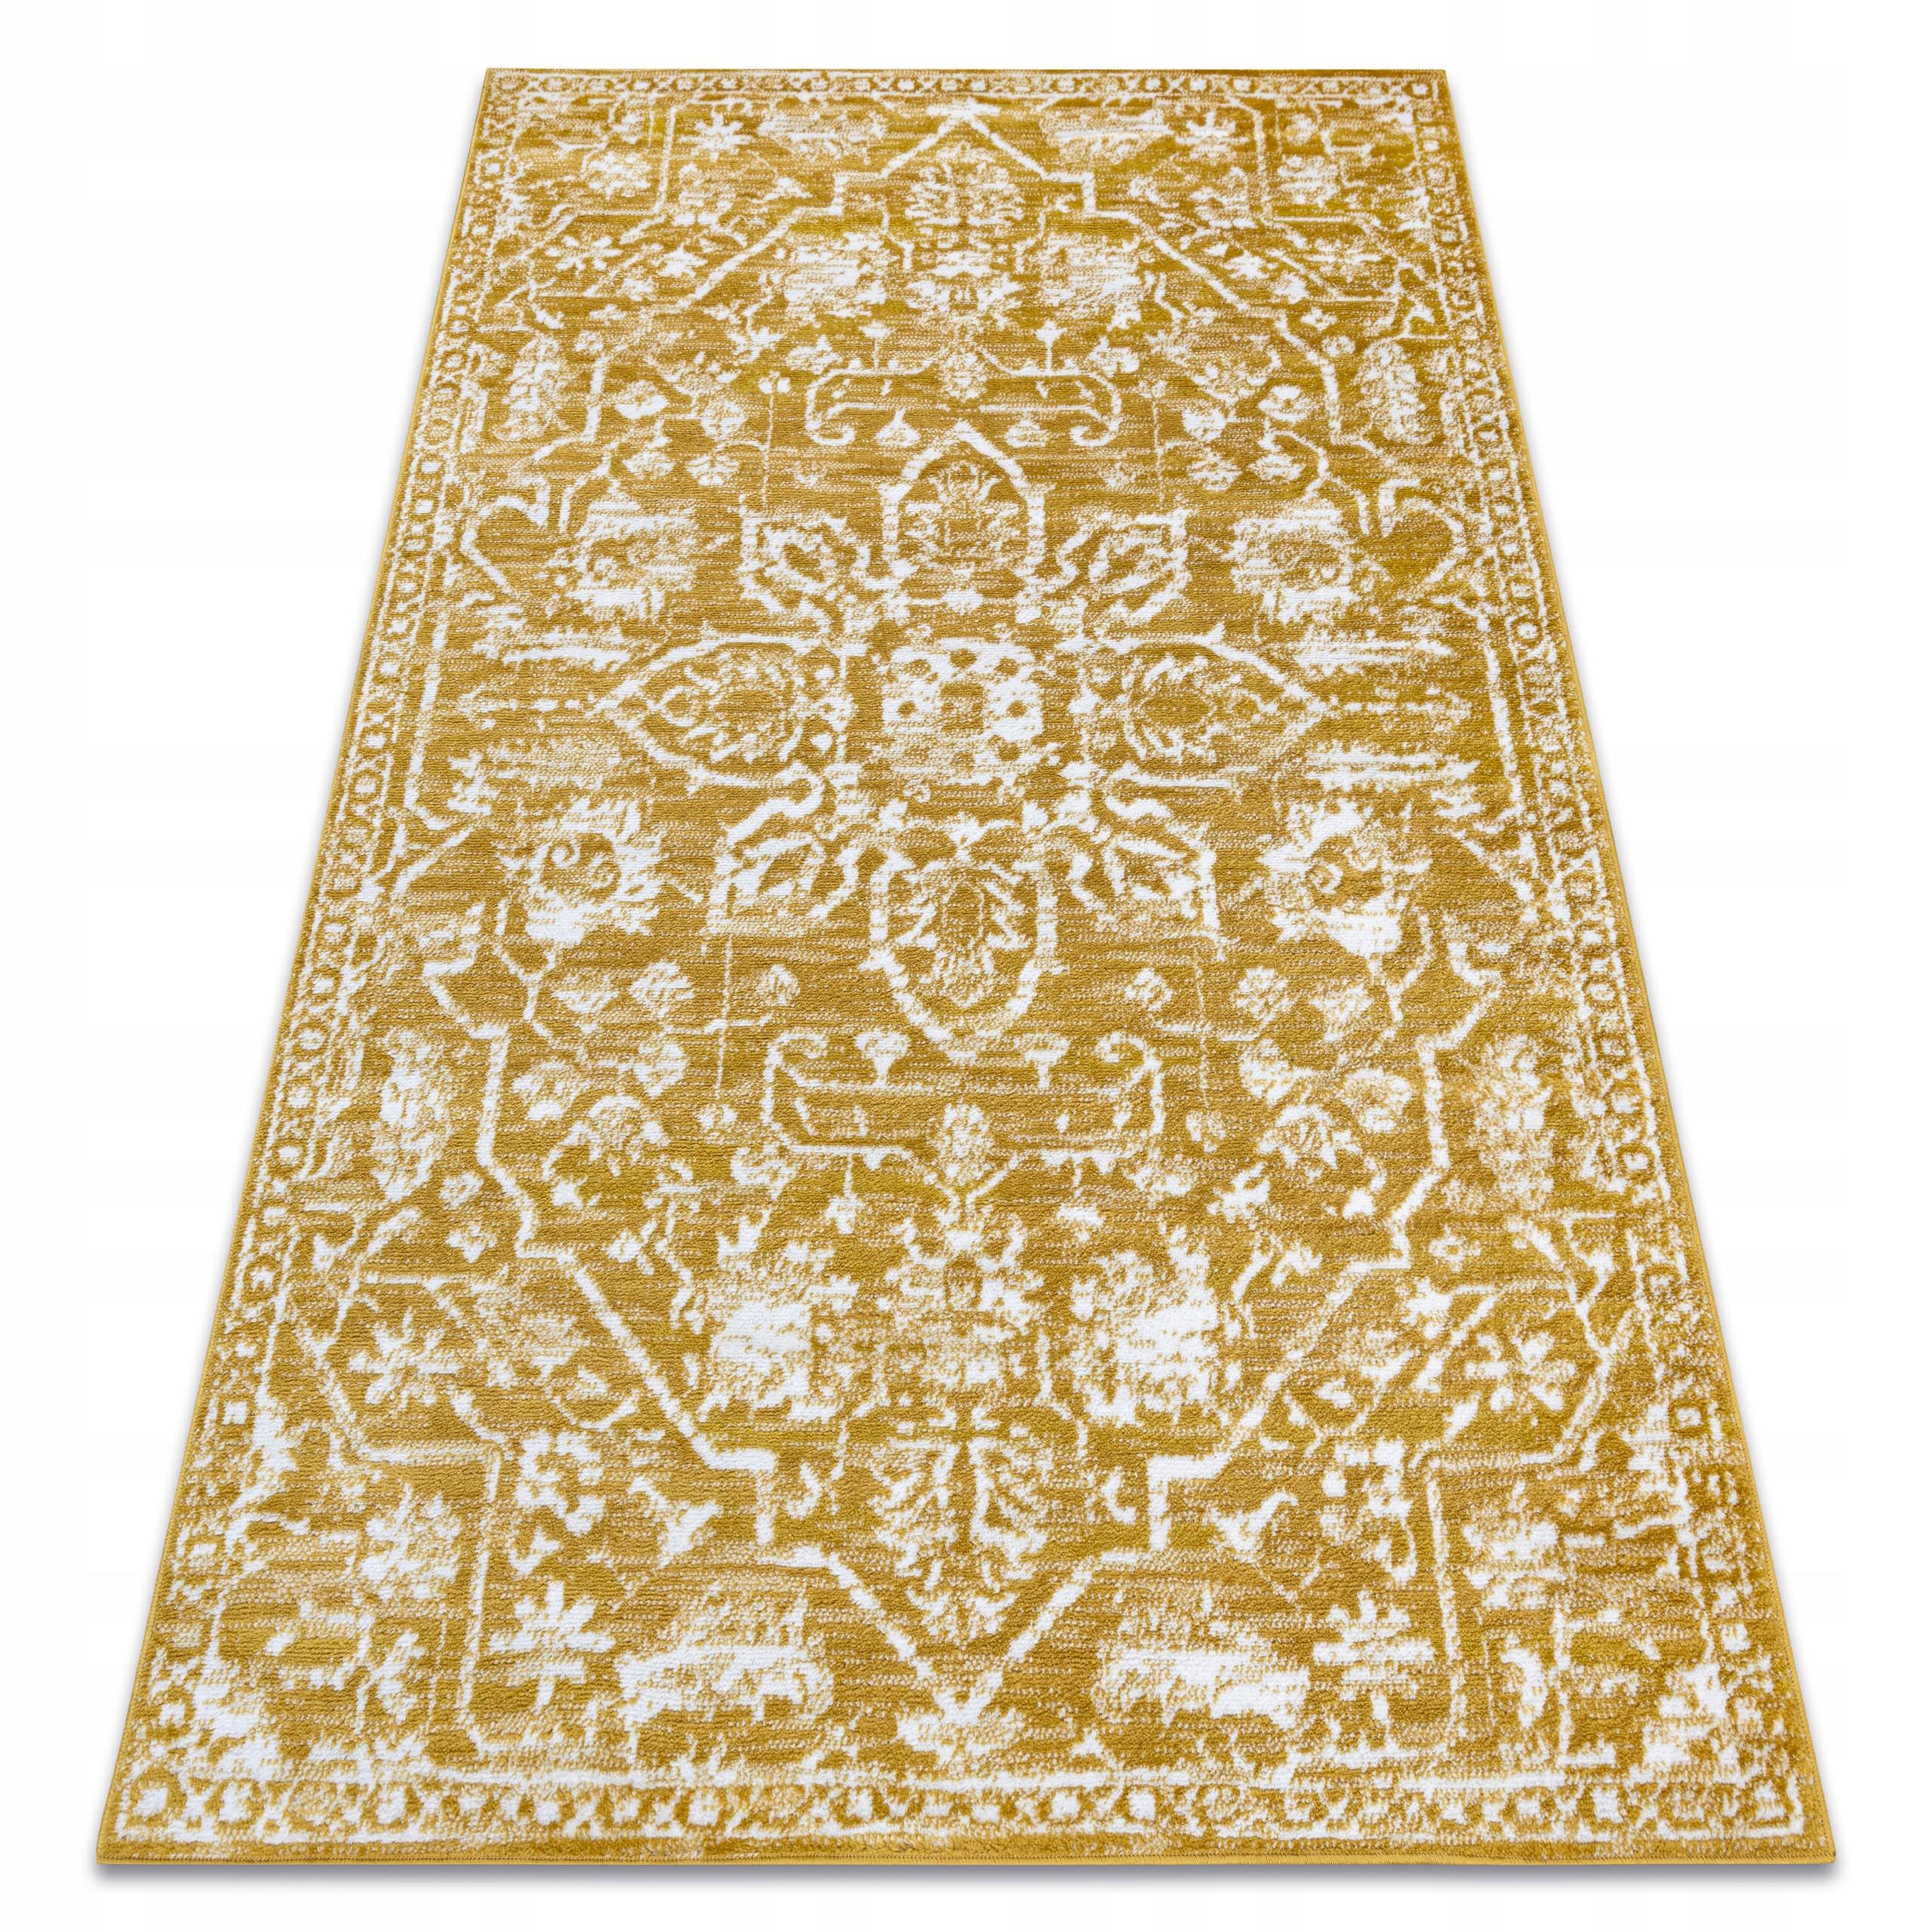 KOBEREC RETRO 180x270 cm VINTAGE Zlatý krém #GR3413